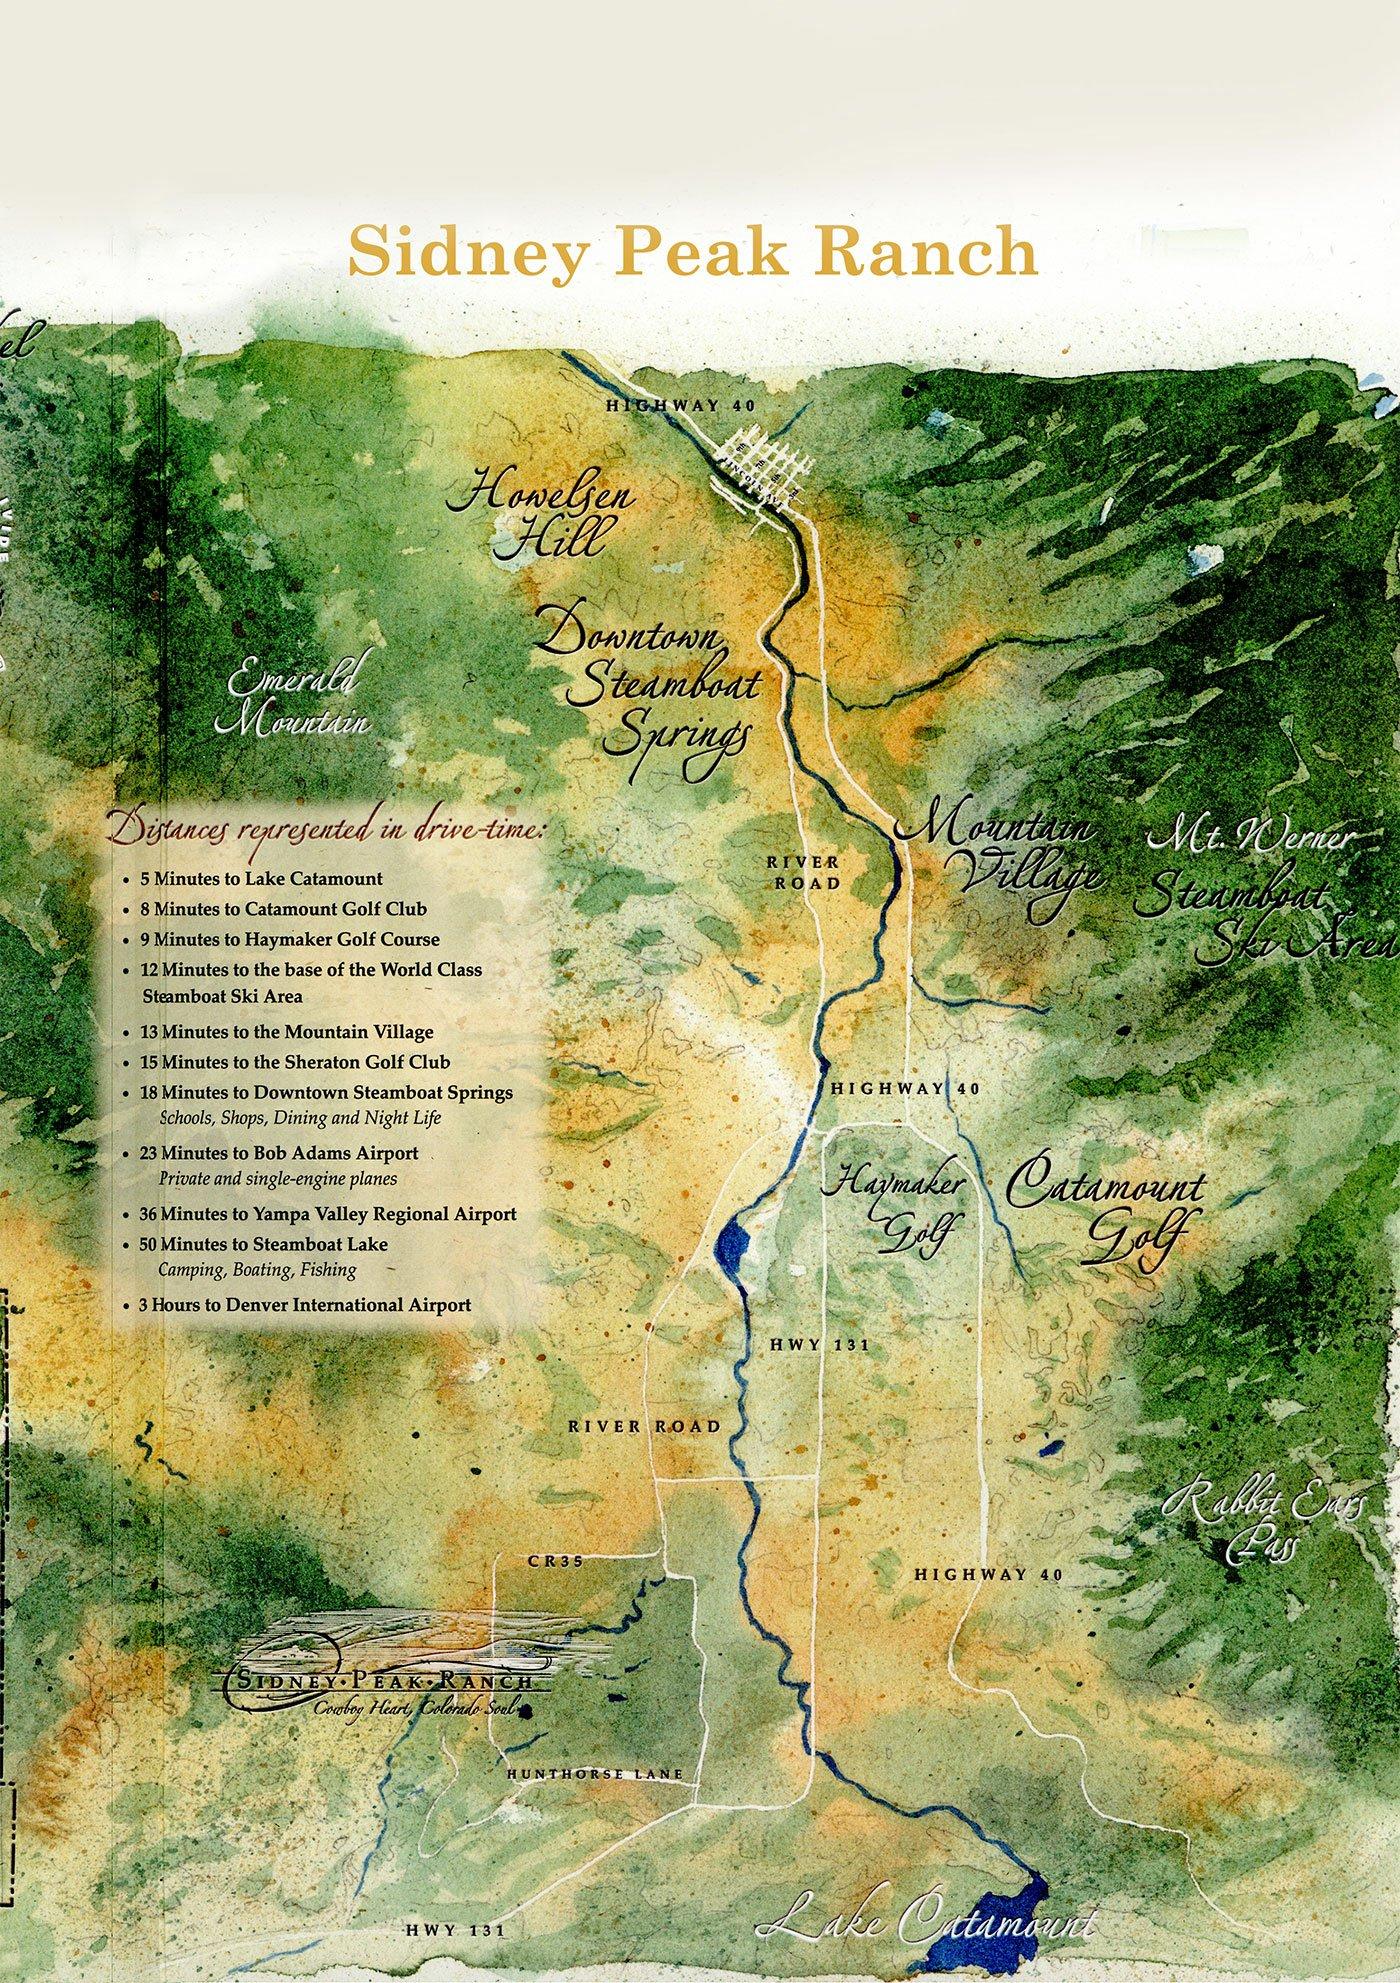 Sidney Peak Ranch Map